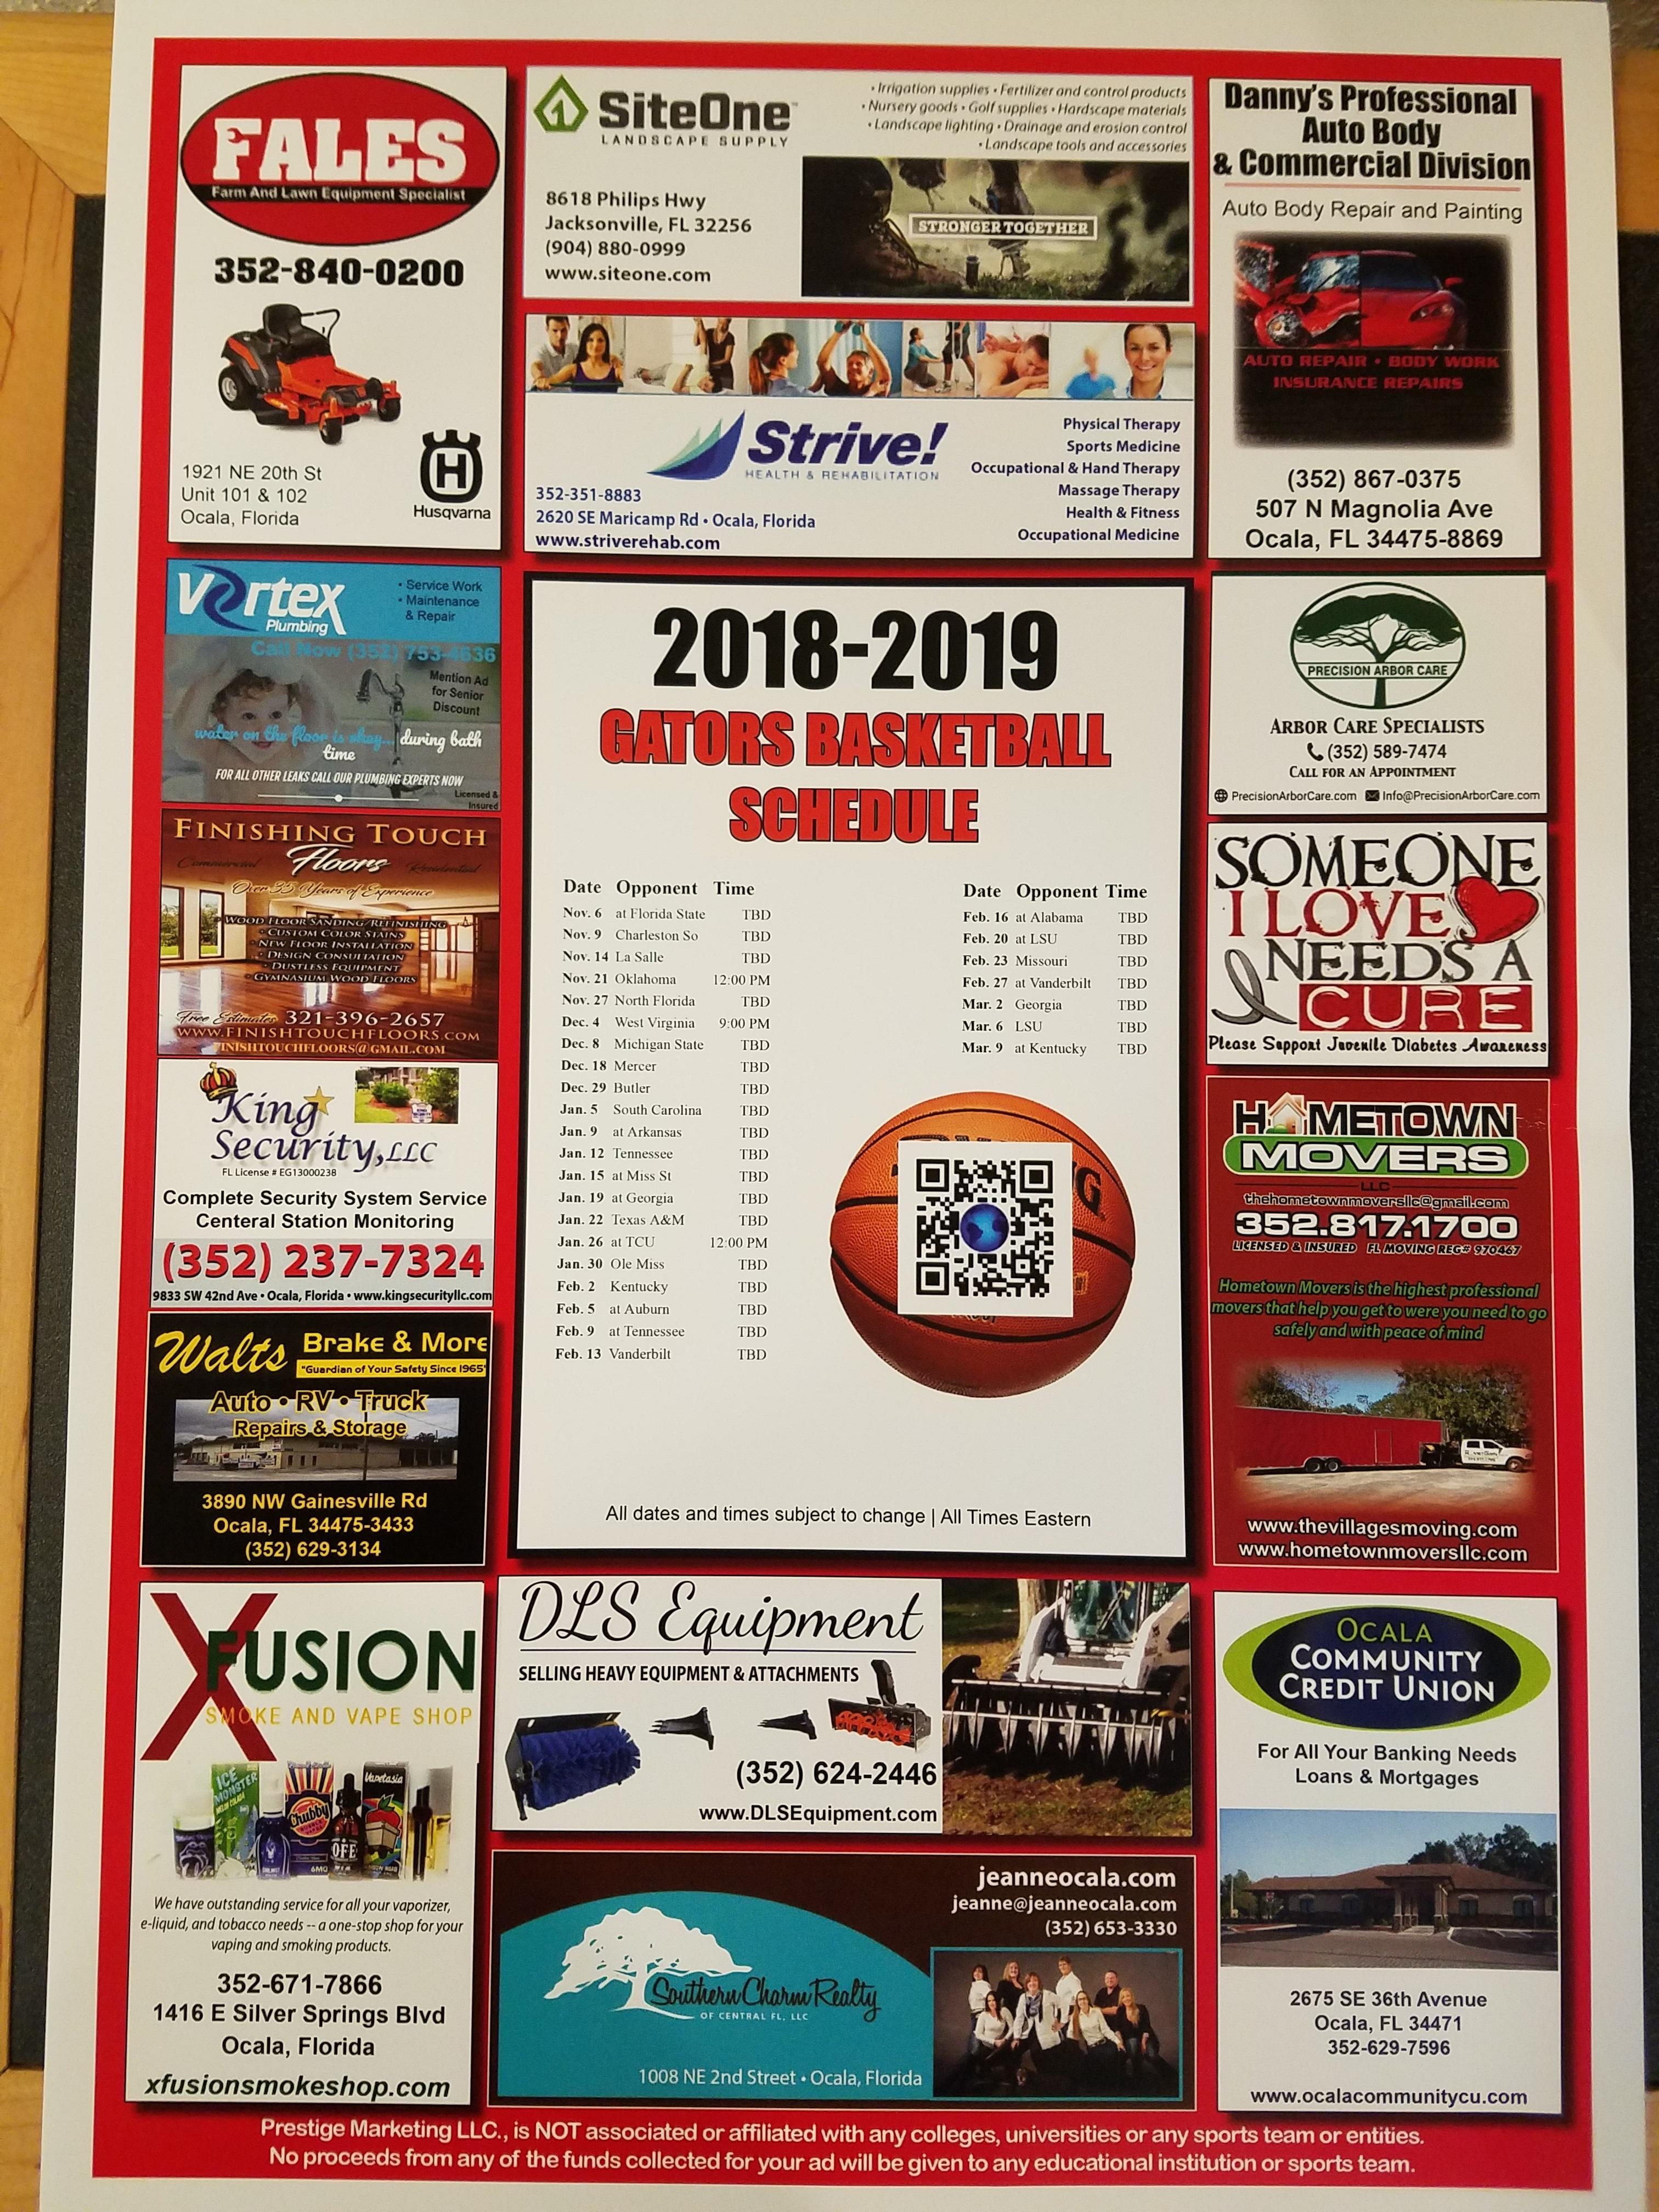 11-2018 UF Basketball Schedule - OCCU Sponsor